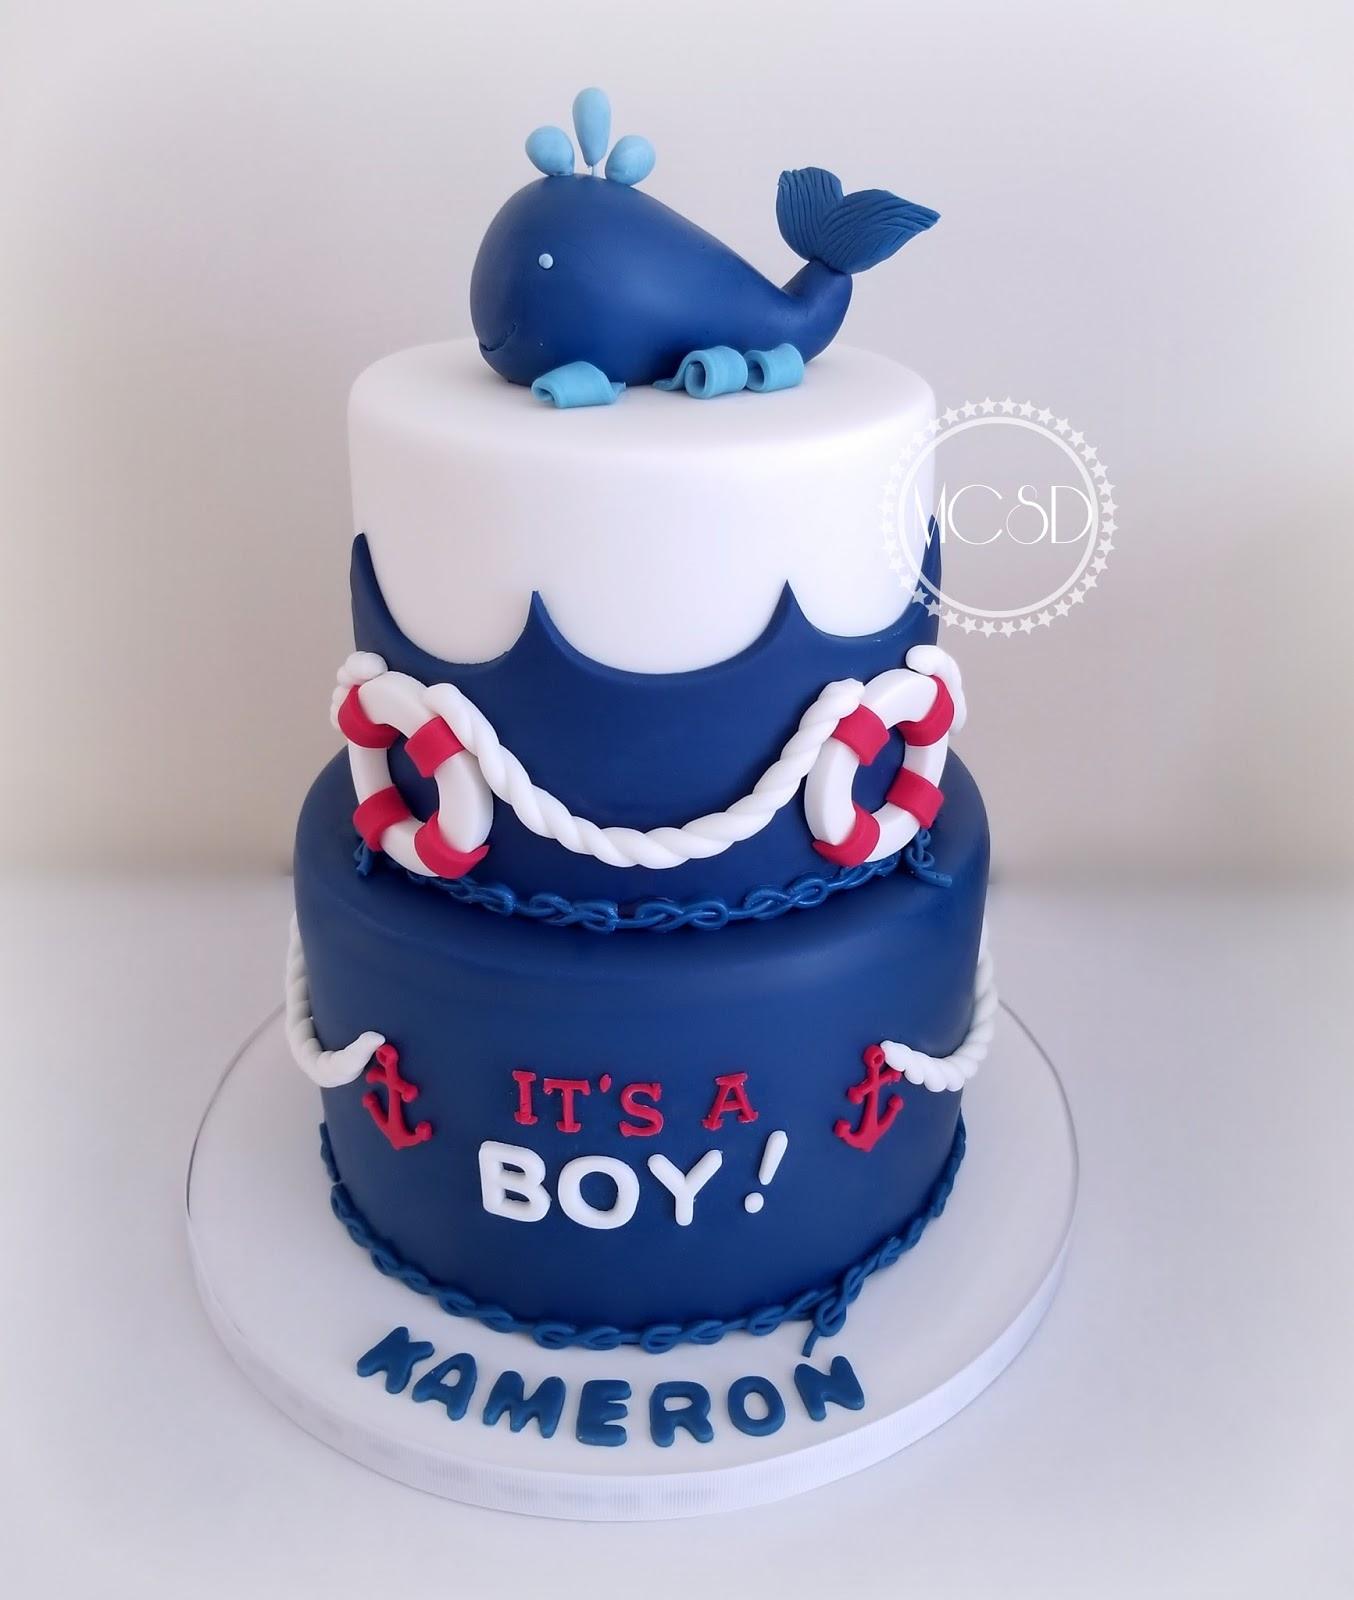 My Cake Sweet Dreams Nautical Baby Shower Cake